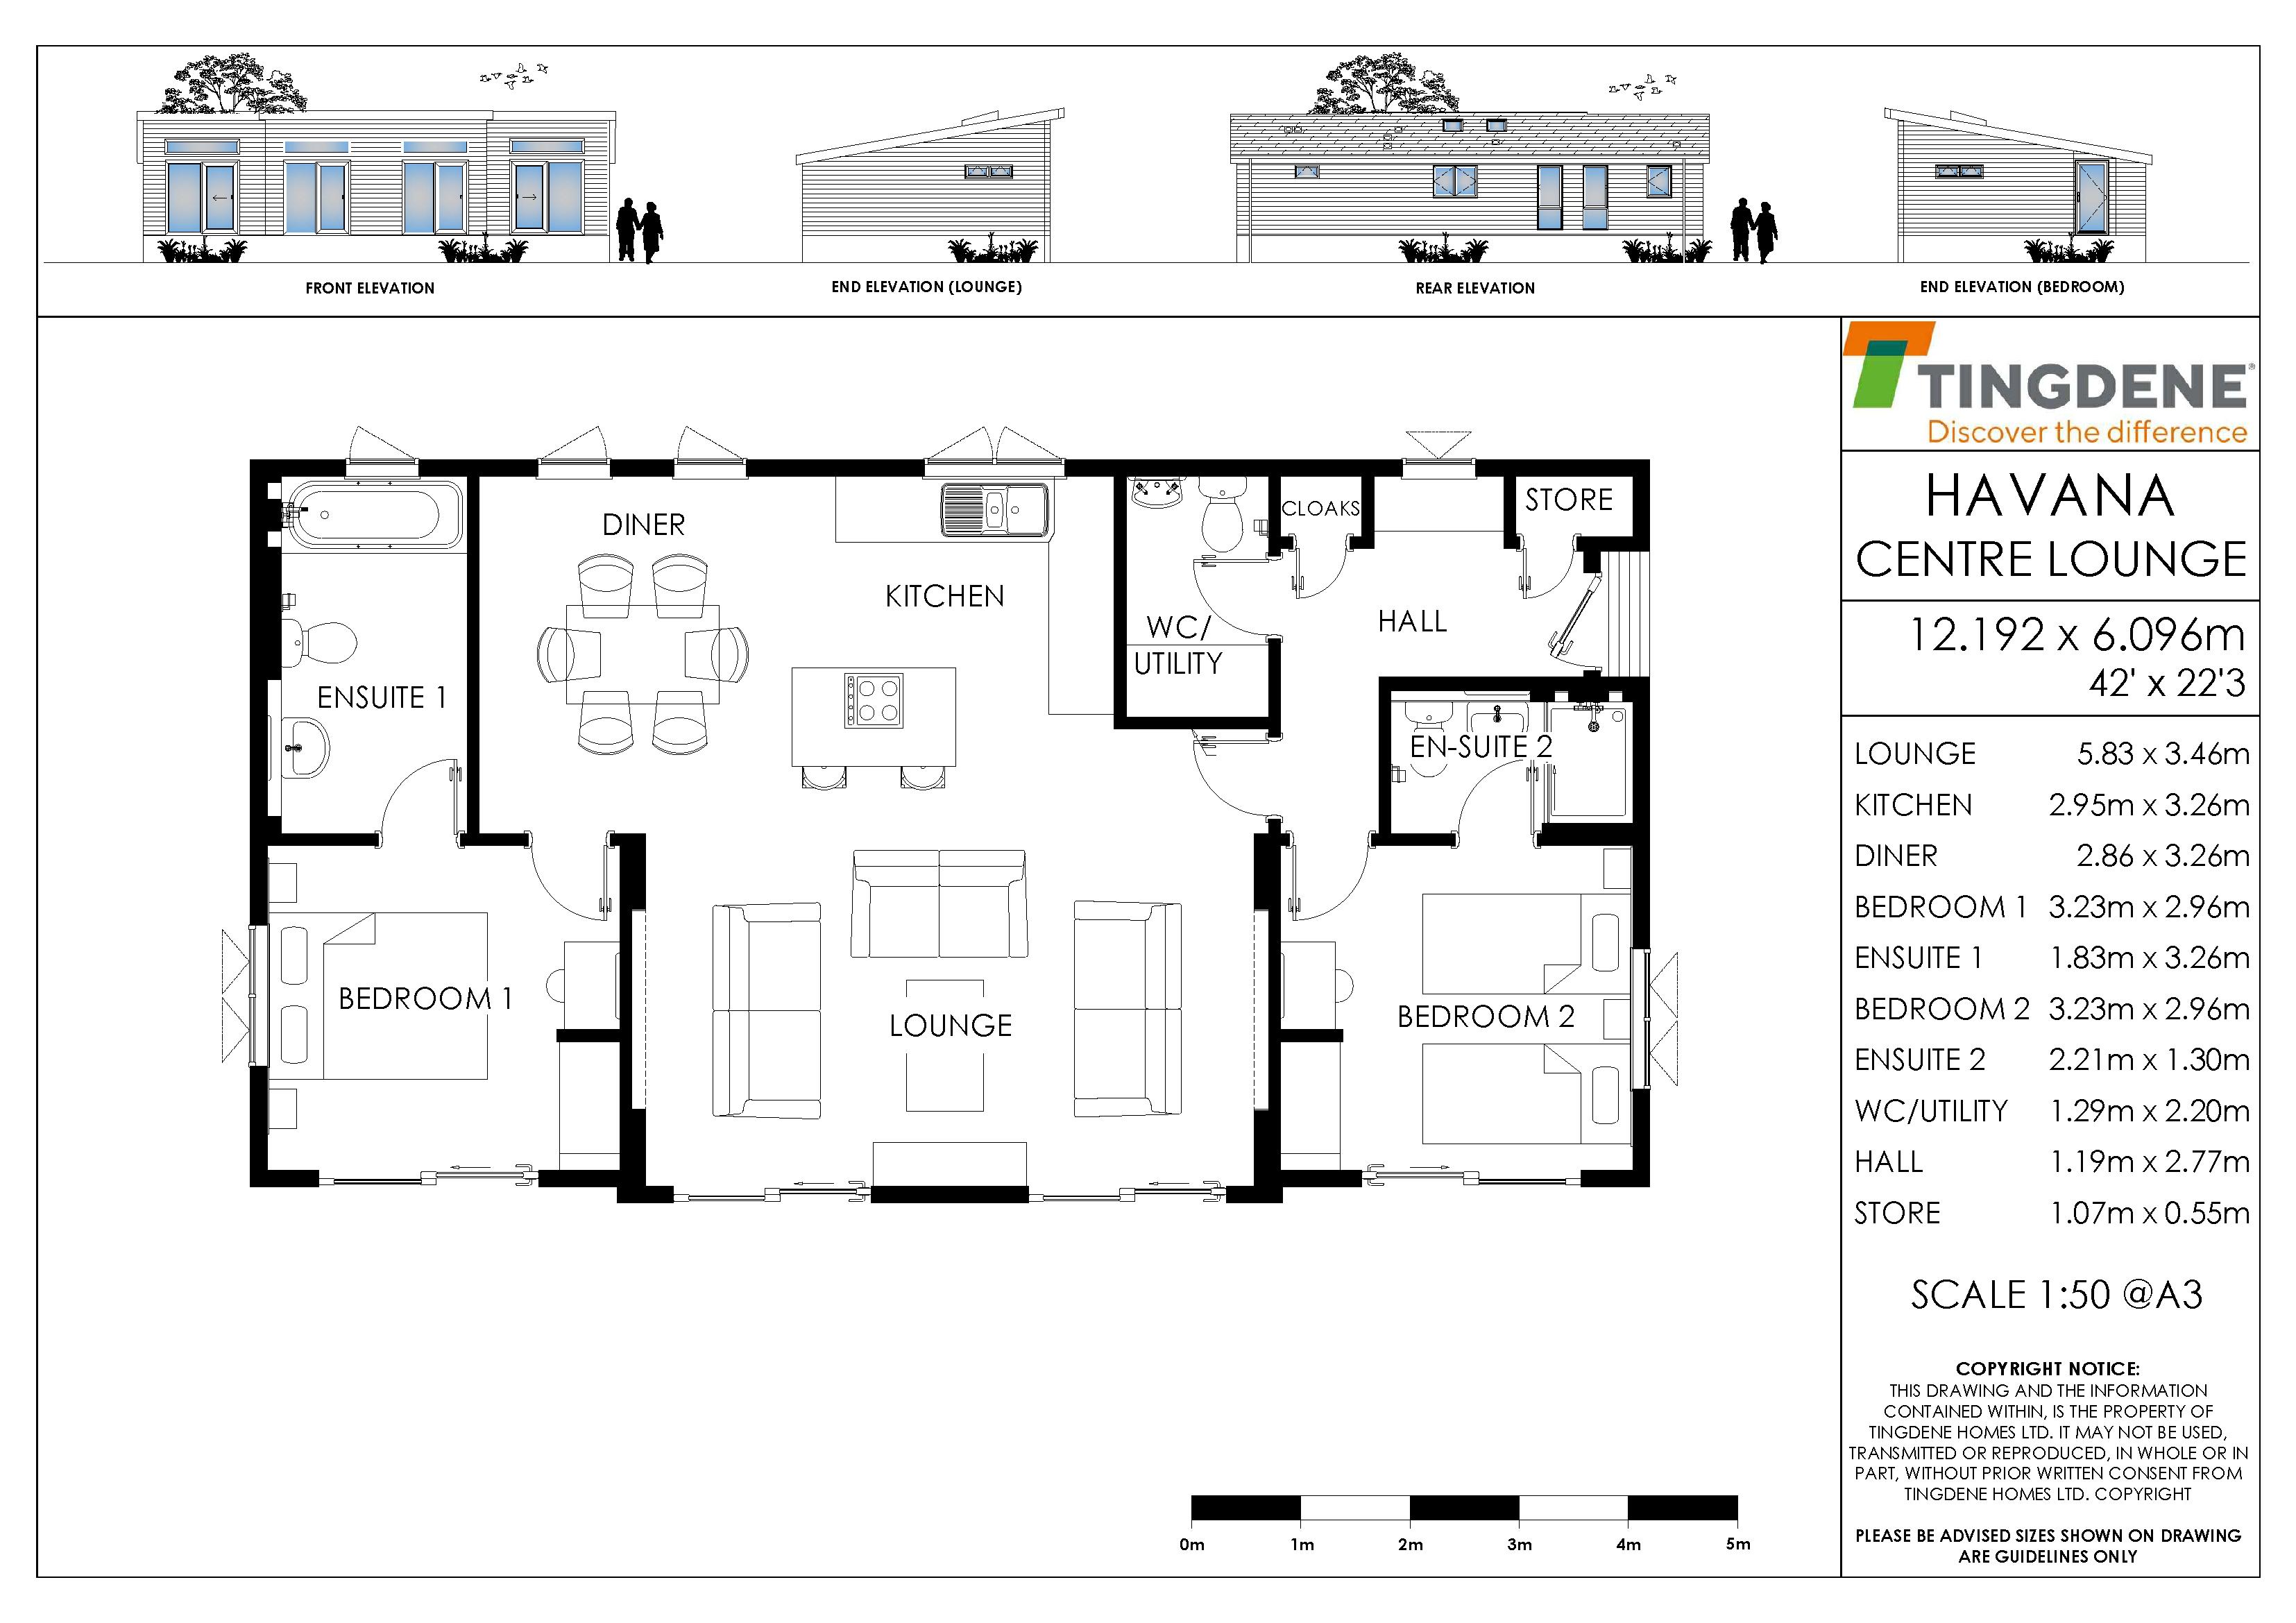 The Havana Centre Lounge Floorplan